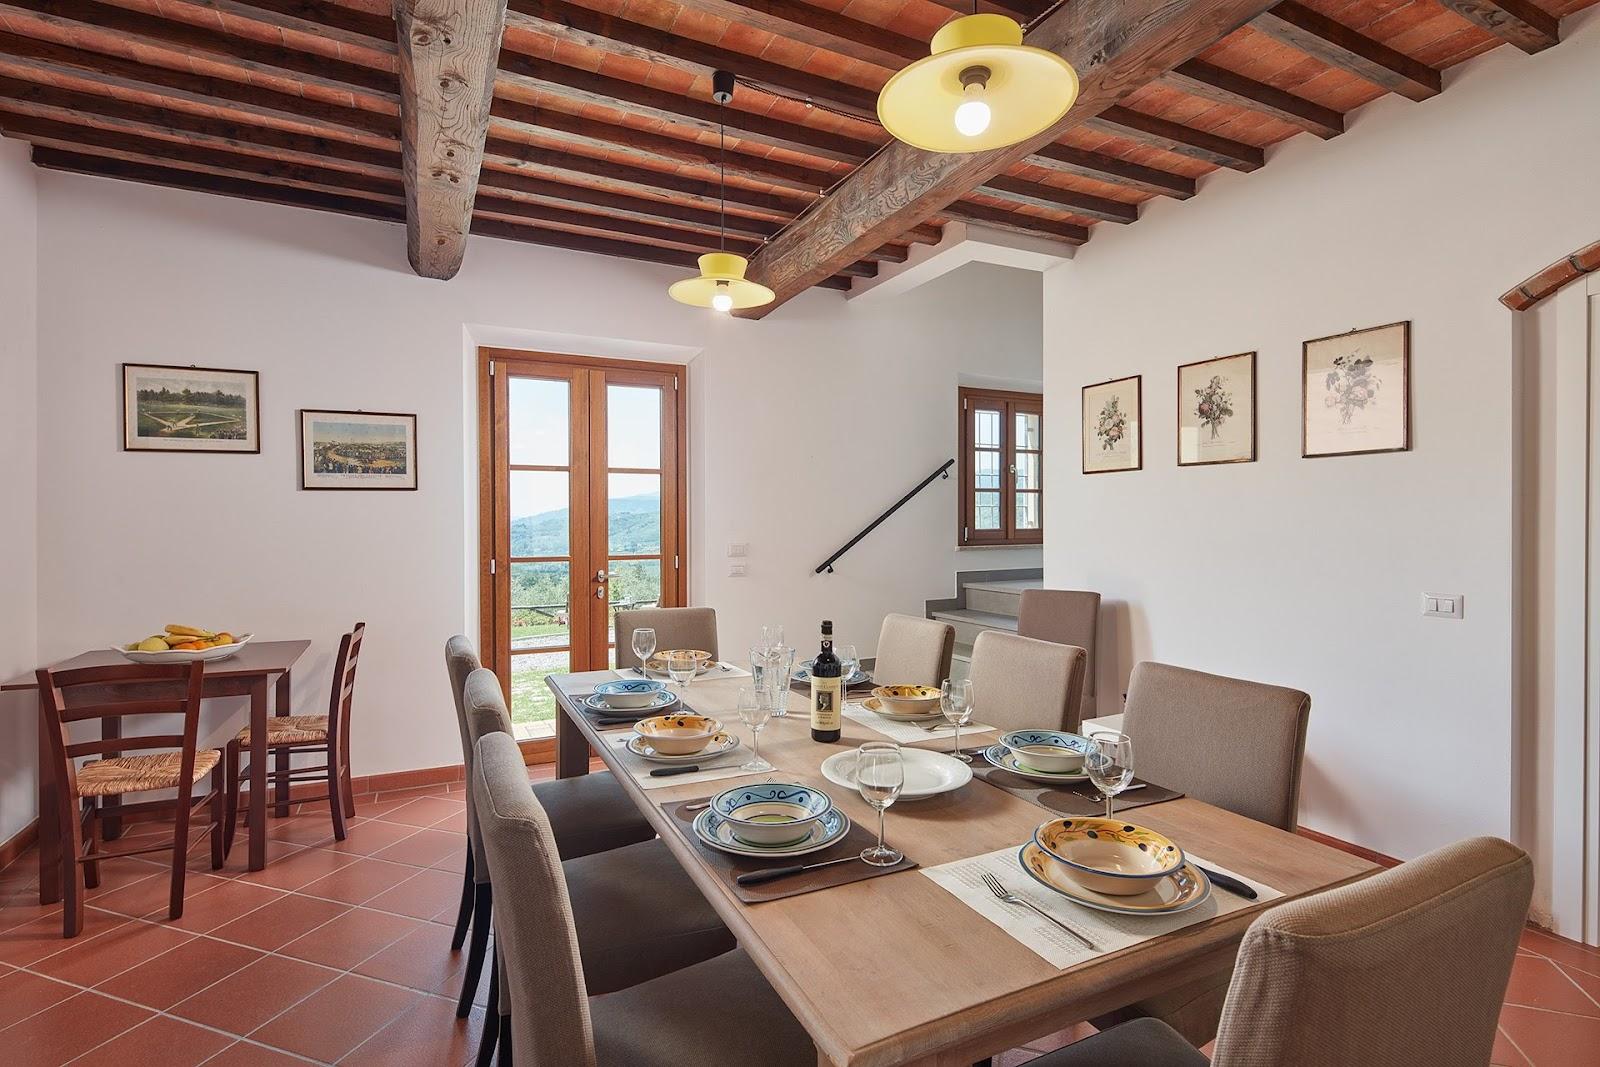 Ferienhaus Corte Paradiso (2570342), Monsummano Terme, Pistoia, Toskana, Italien, Bild 22